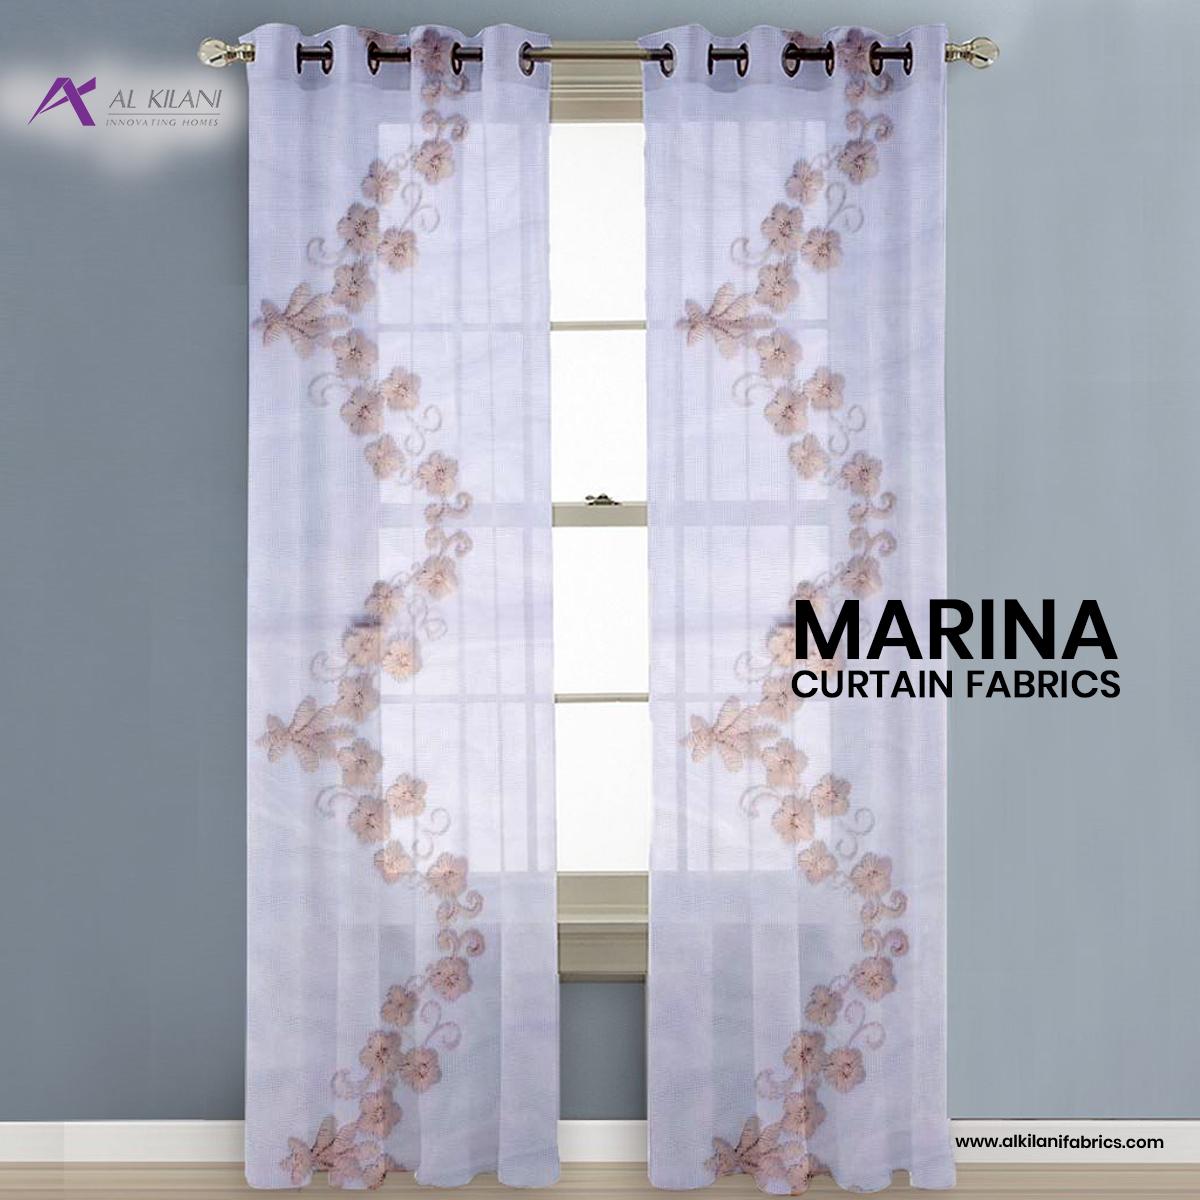 Best curtain accessories in Abu Dhabi, UAE